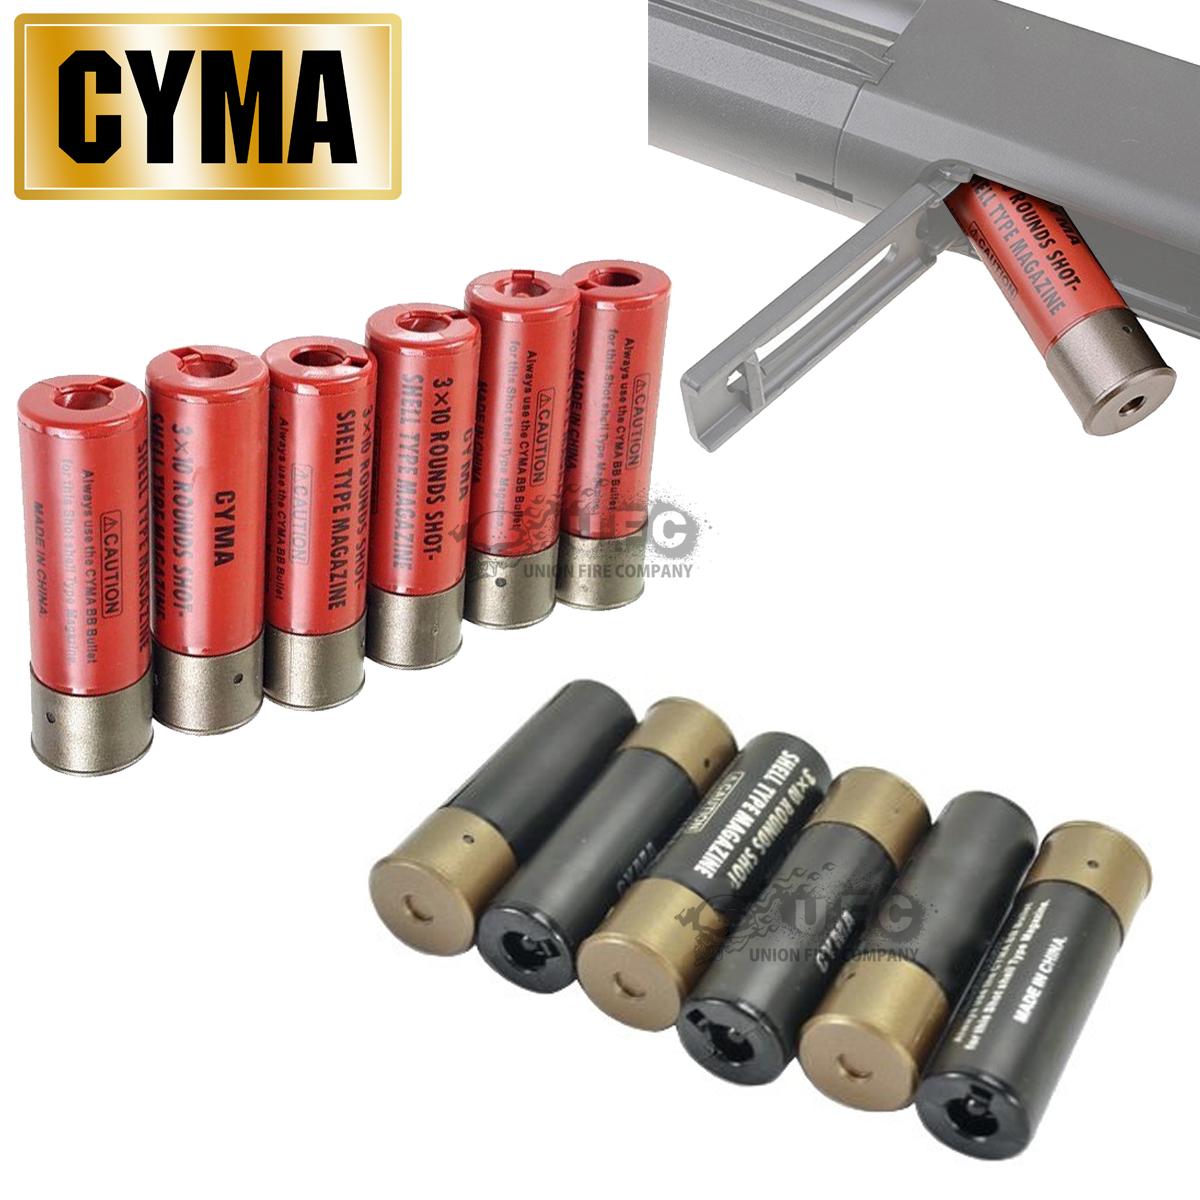 CYMA 30rds ショットシェル型マガジン 6Shell